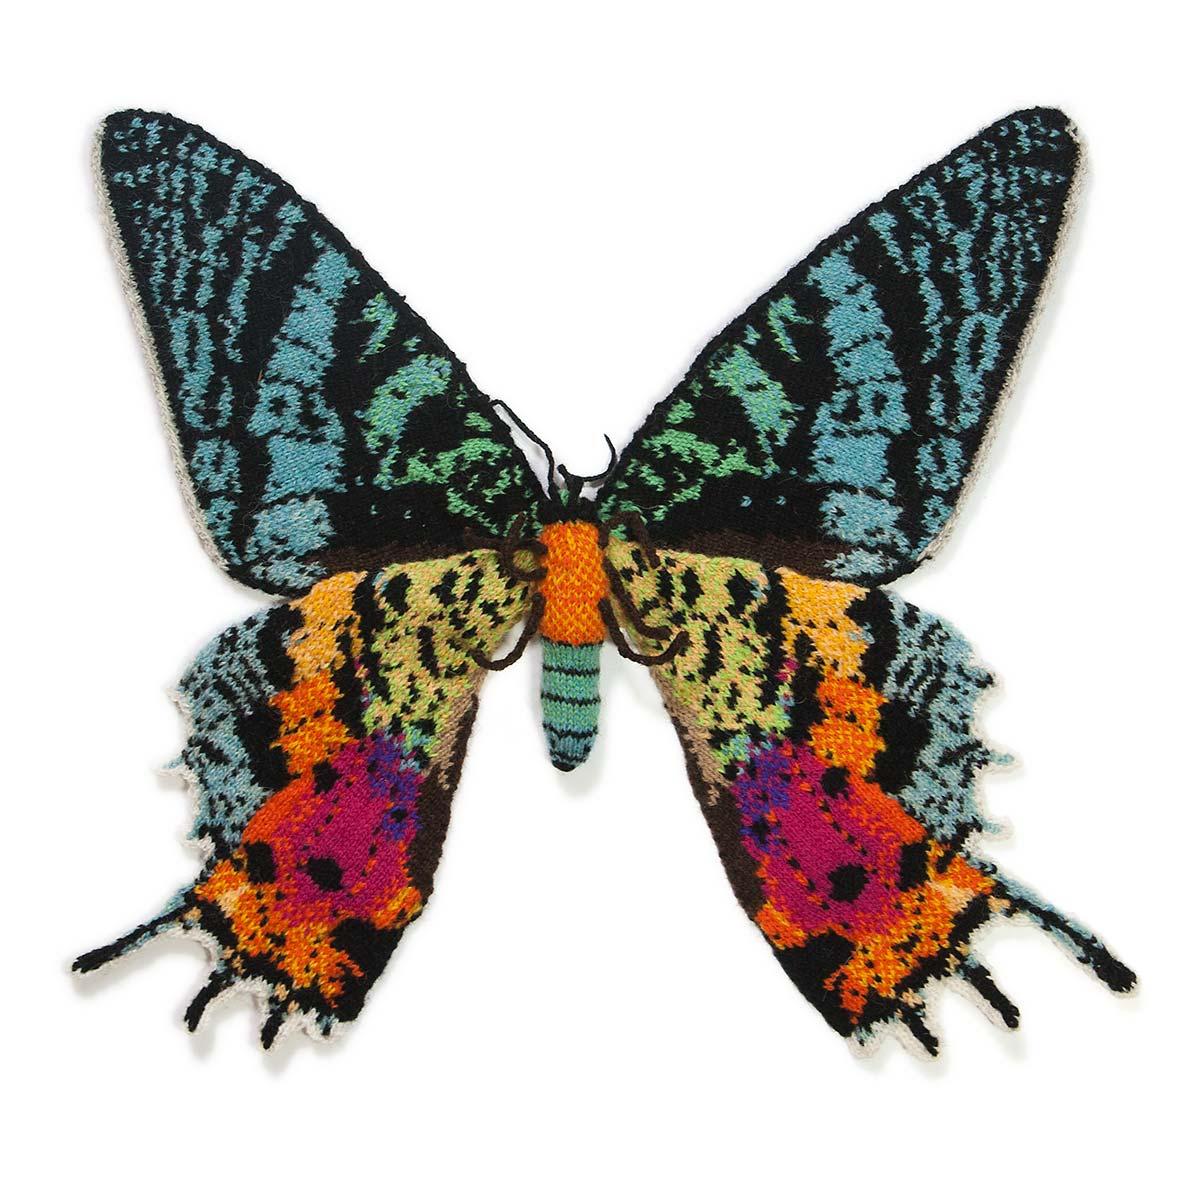 Madagascan Sunset Moth - Chrysiridia rhipheus